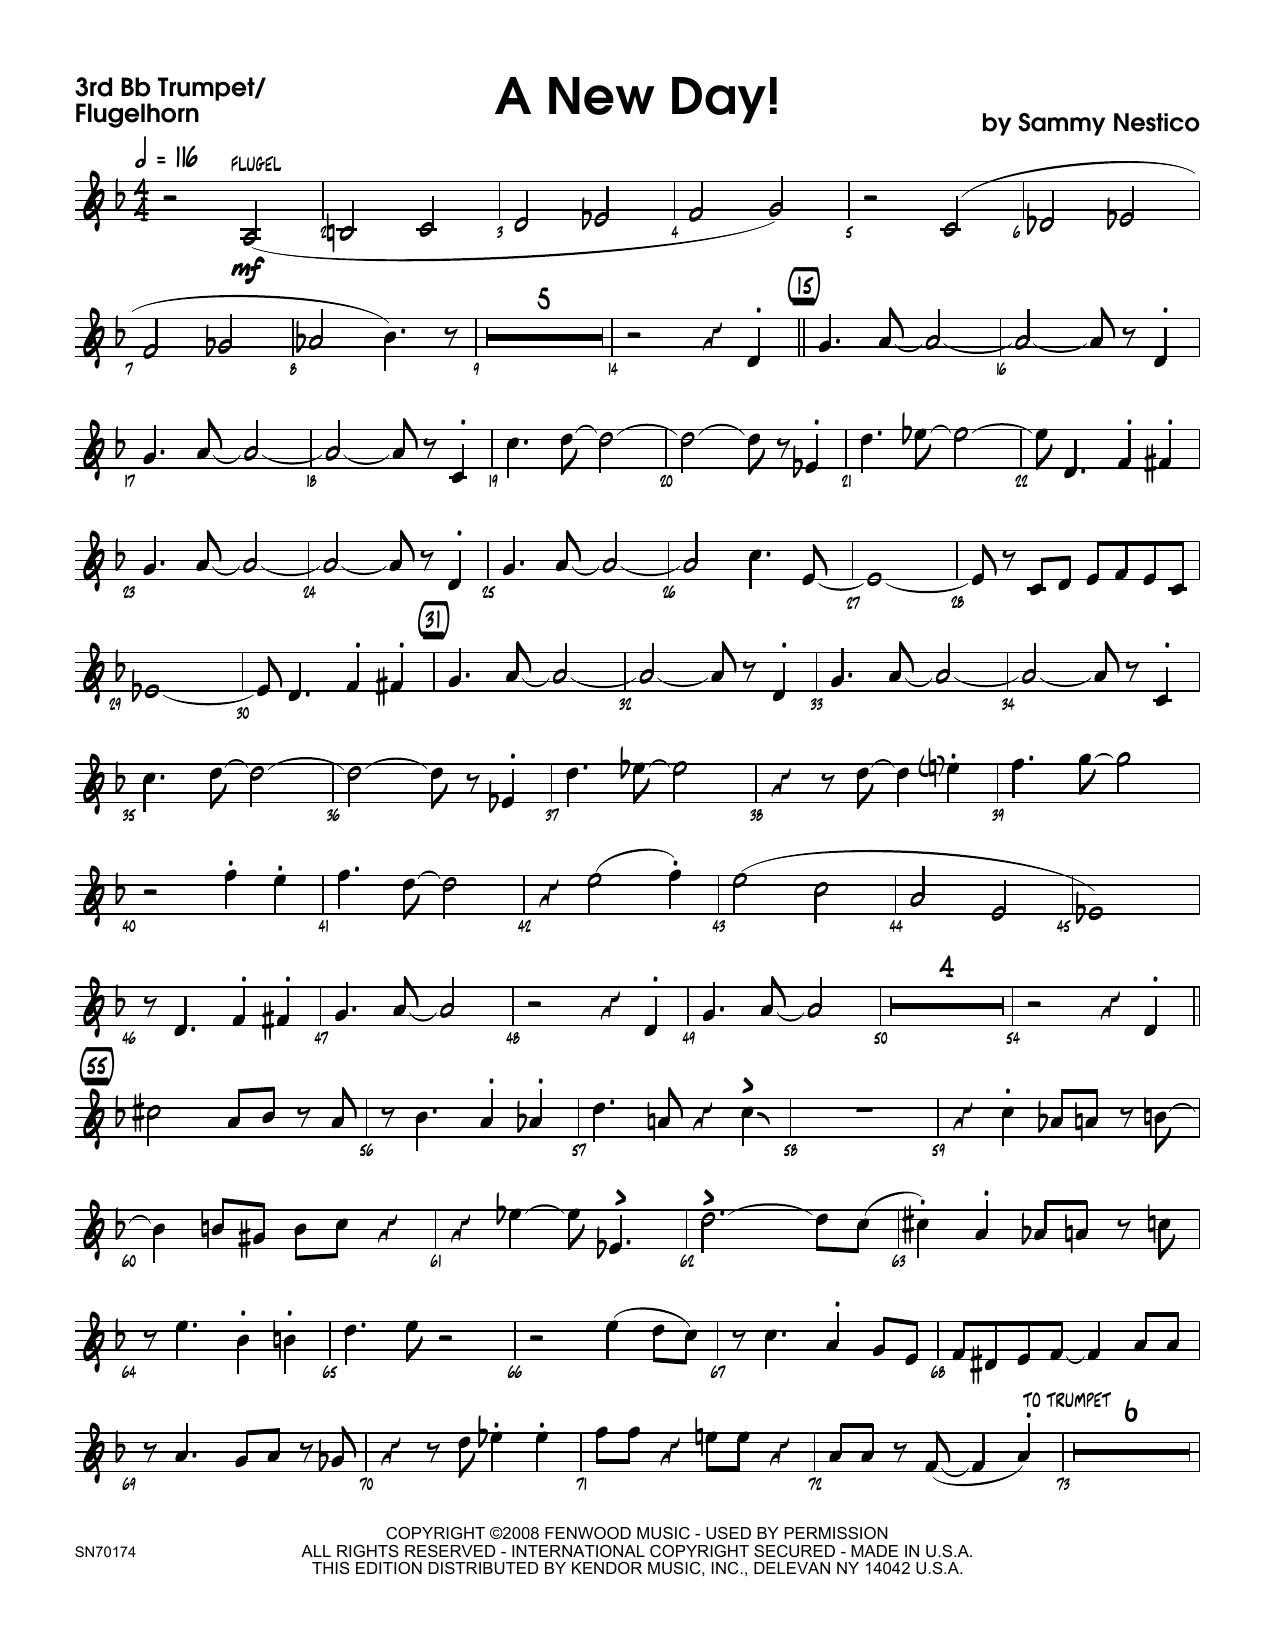 A New Day! - 3rd Bb Trumpet Sheet Music